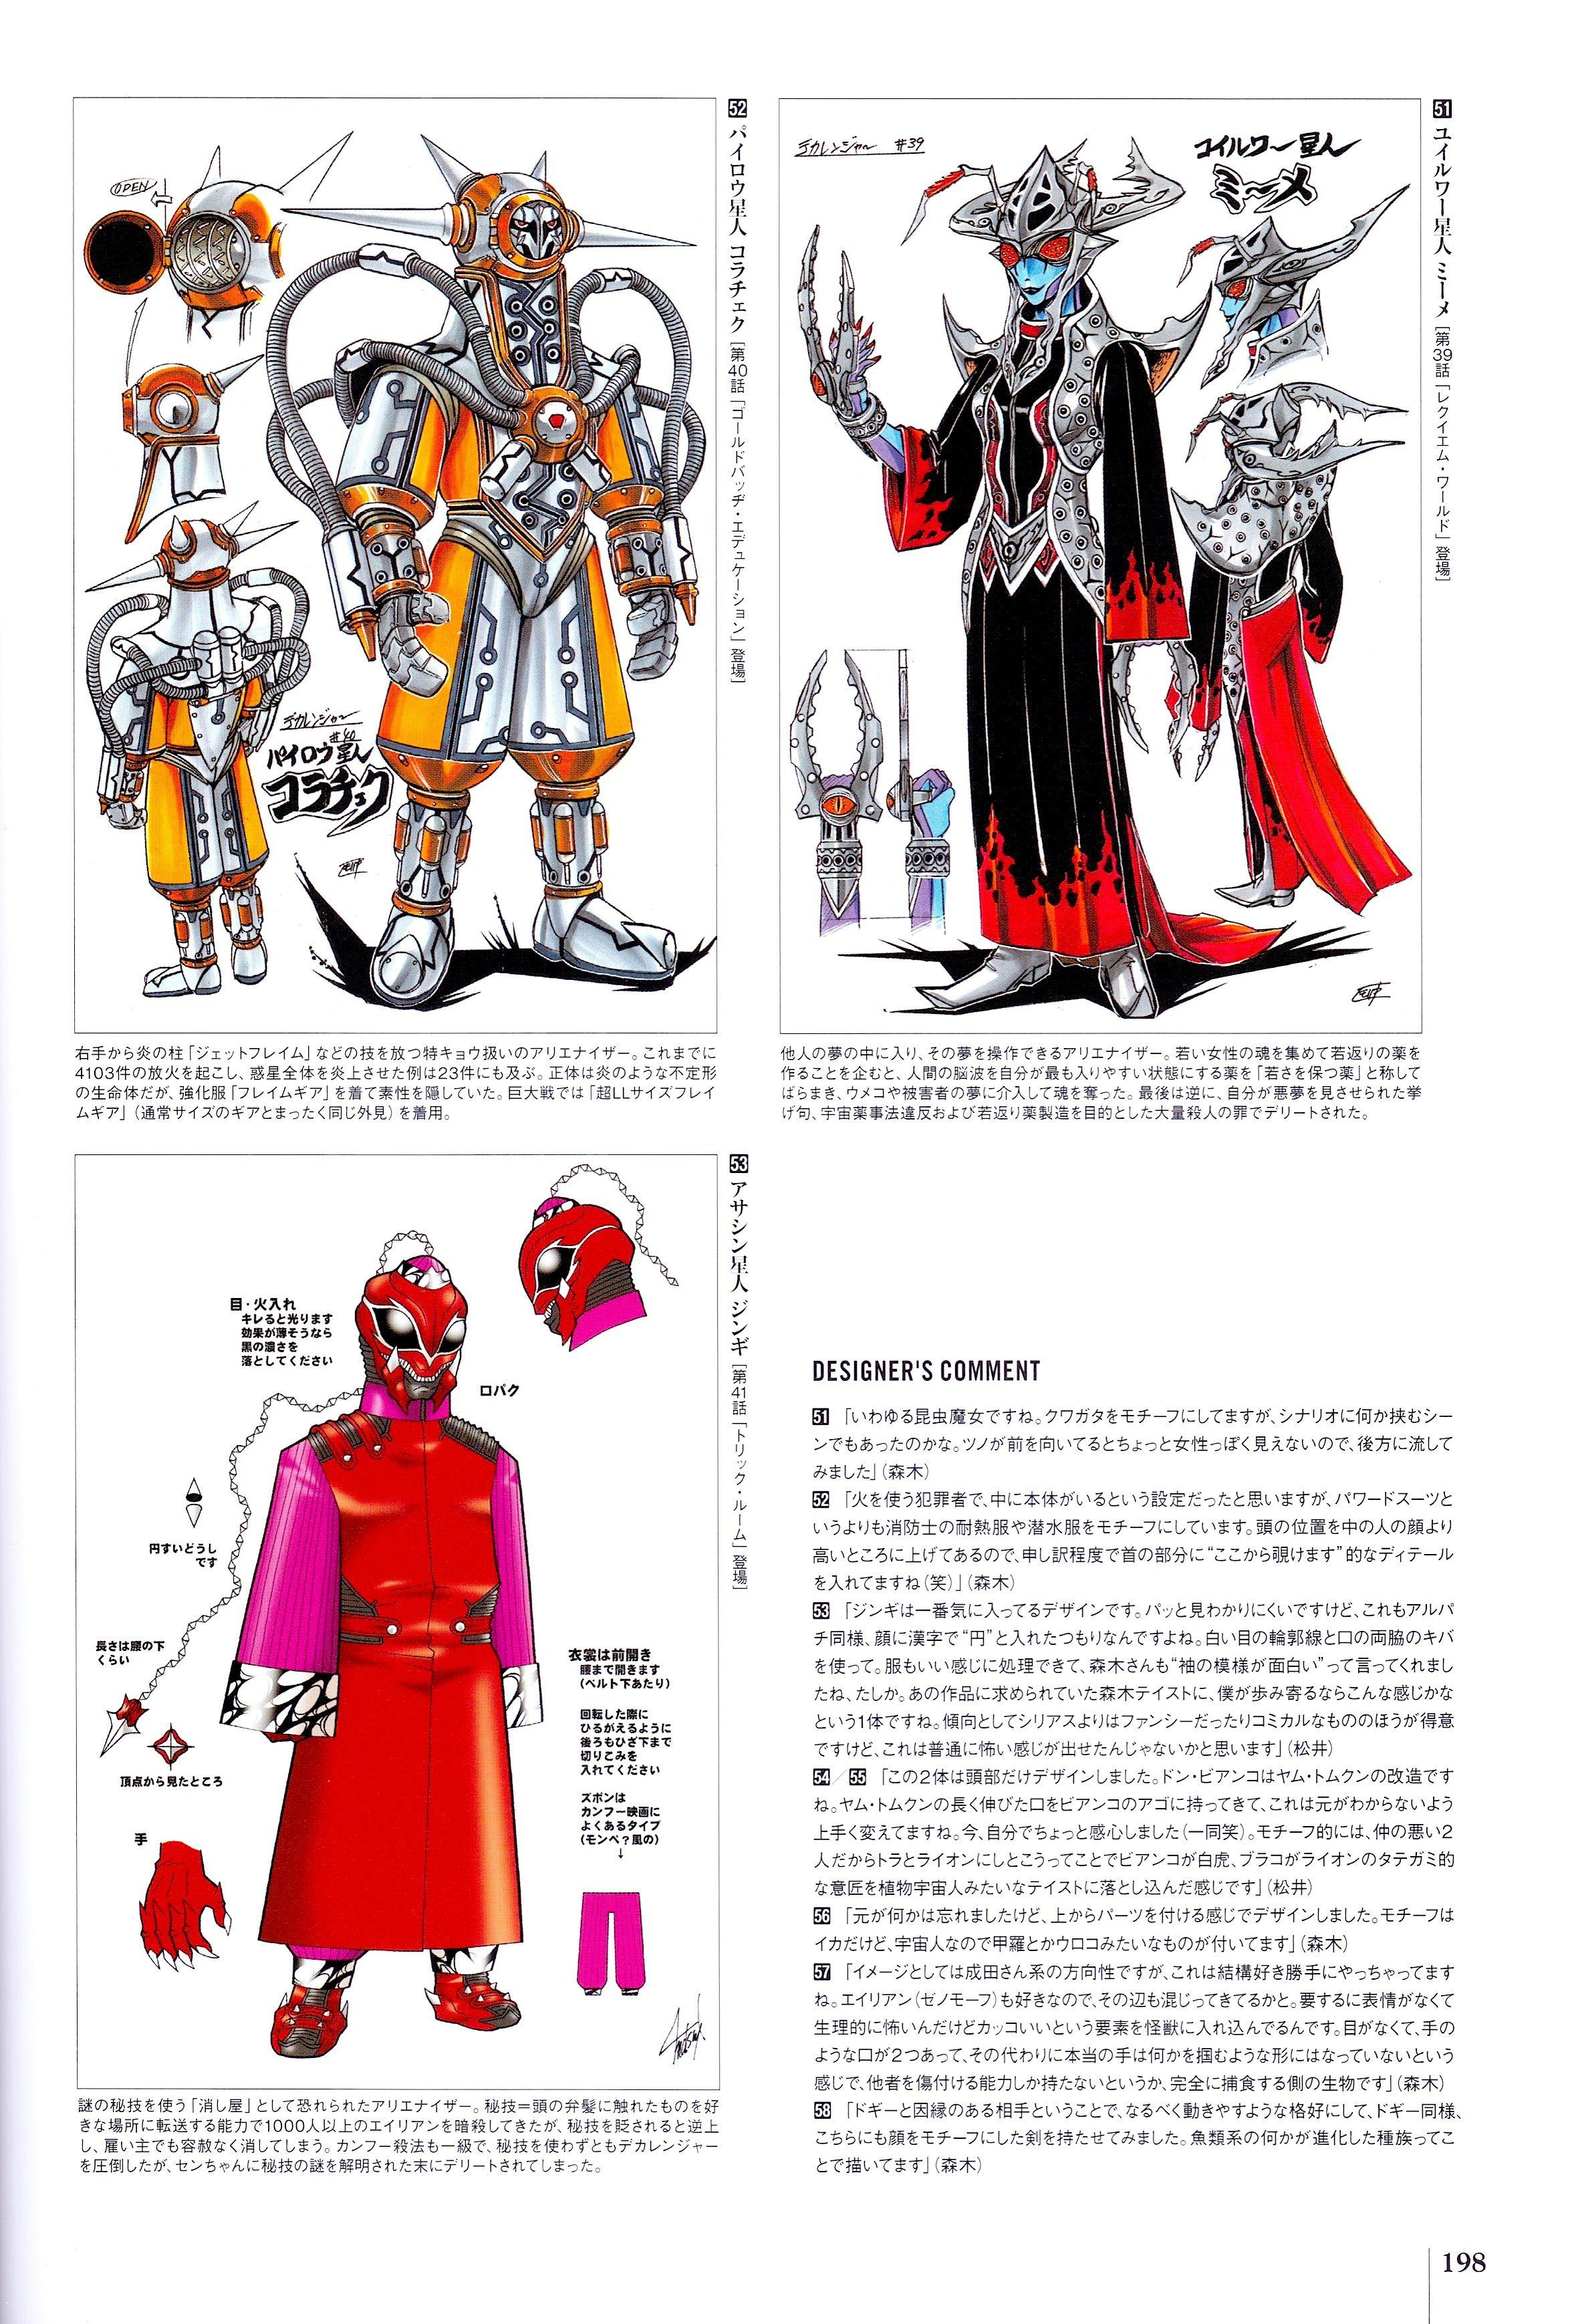 Kaiju History 2004 Dekaranger | Power Rangers | Pinterest